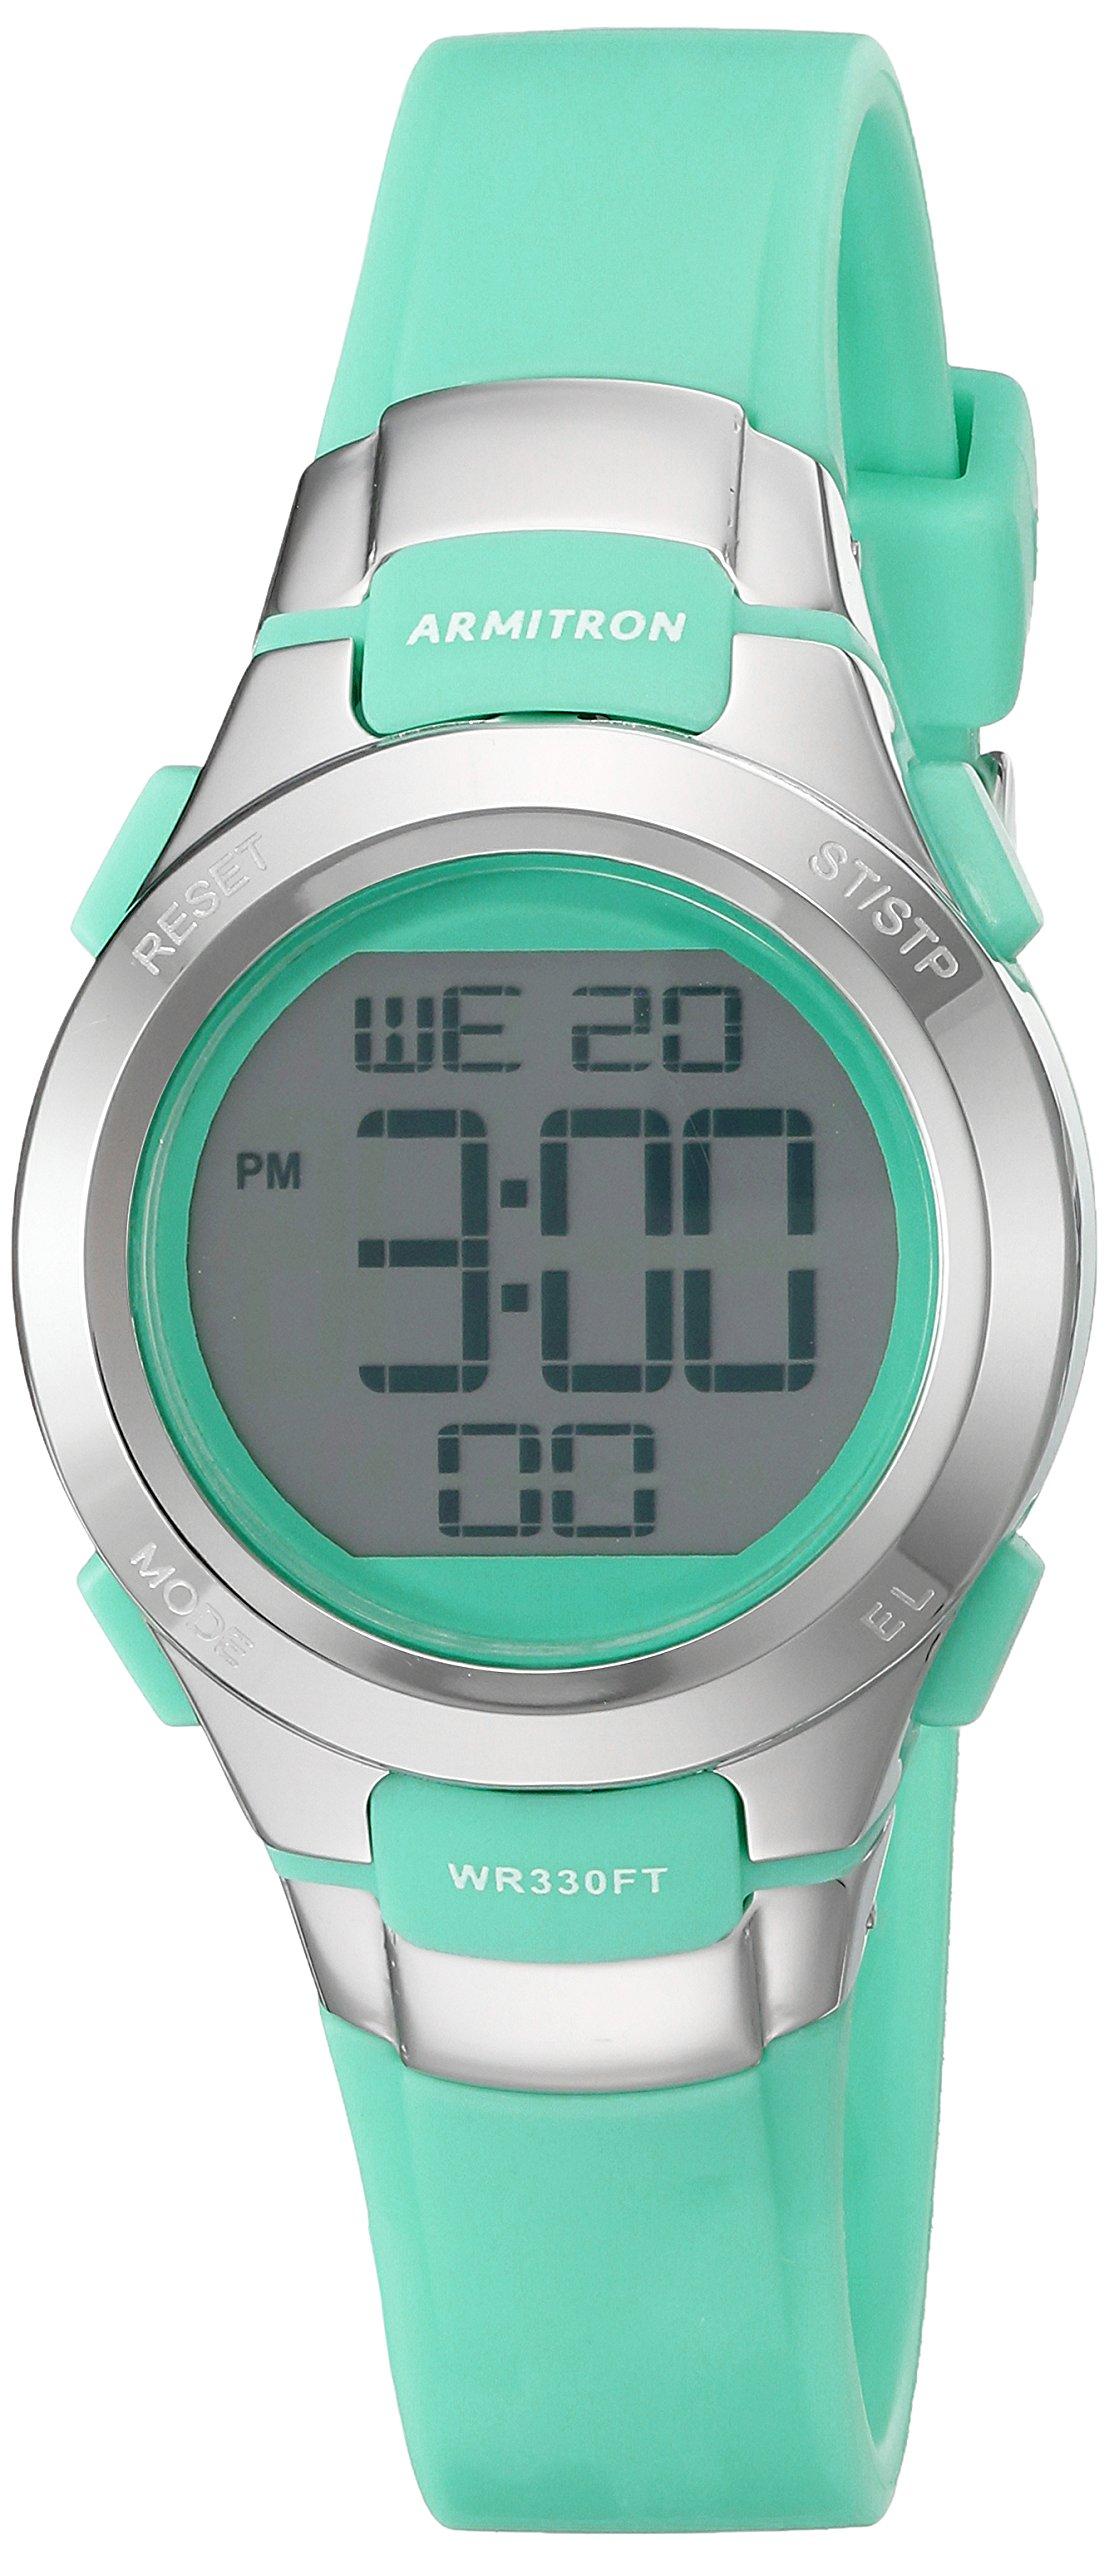 Armitron Sport Women's 45/7012TEL Digital Chronograph Teal Resin Strap Watch by Armitron Sport